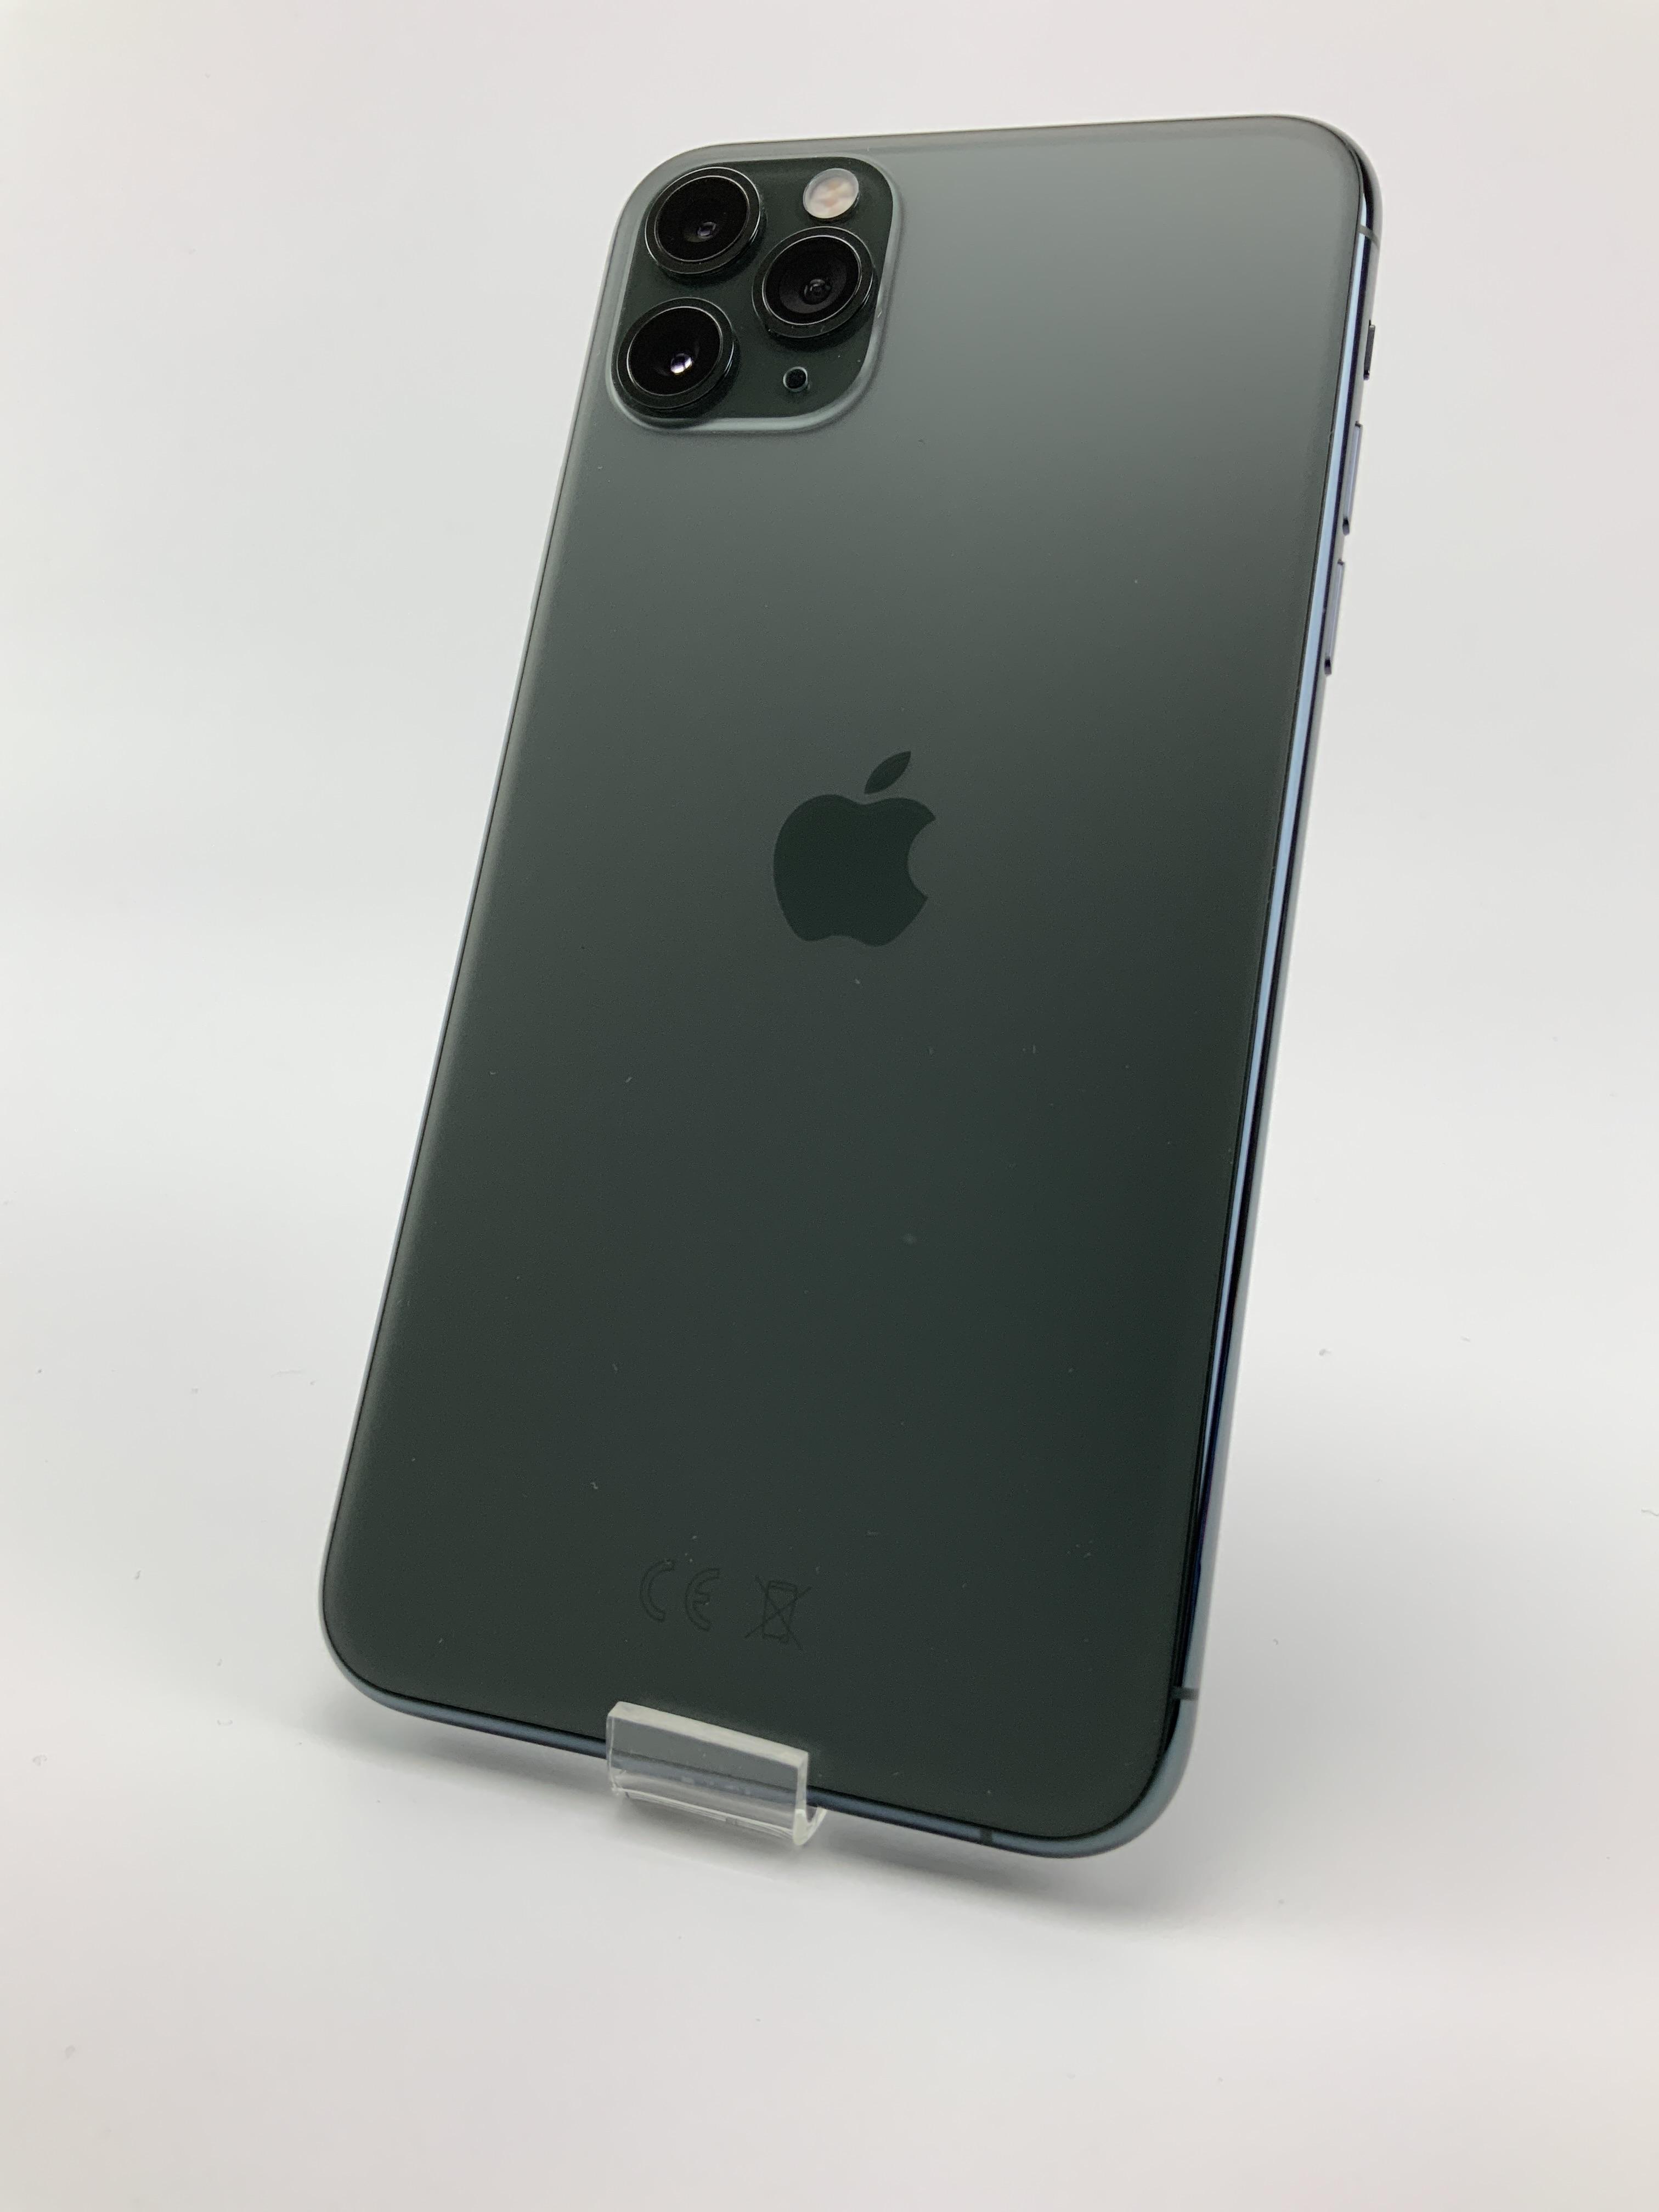 iPhone 11 Pro Max 256GB, 256GB, Midnight Green, imagen 2